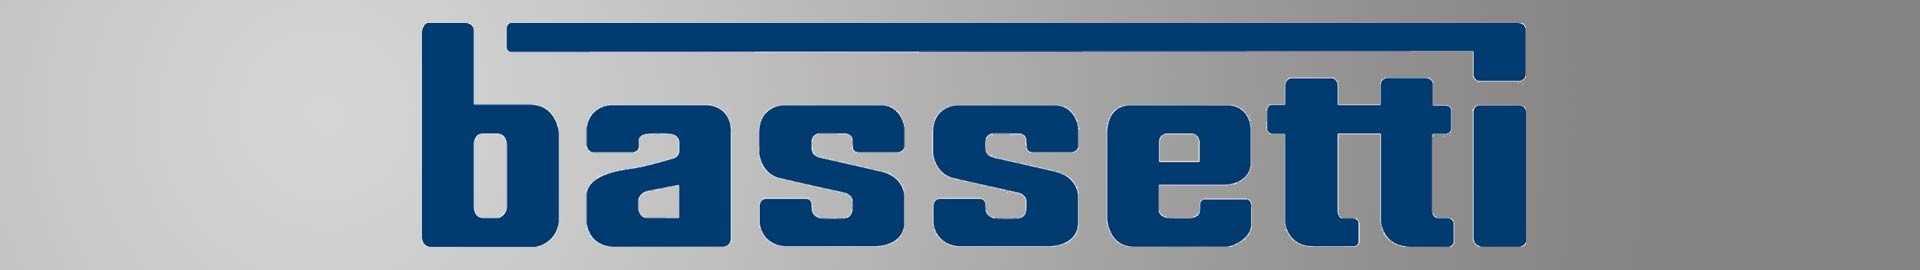 Offerta lenzuola Bassetti - Raso line L.F.D. Home